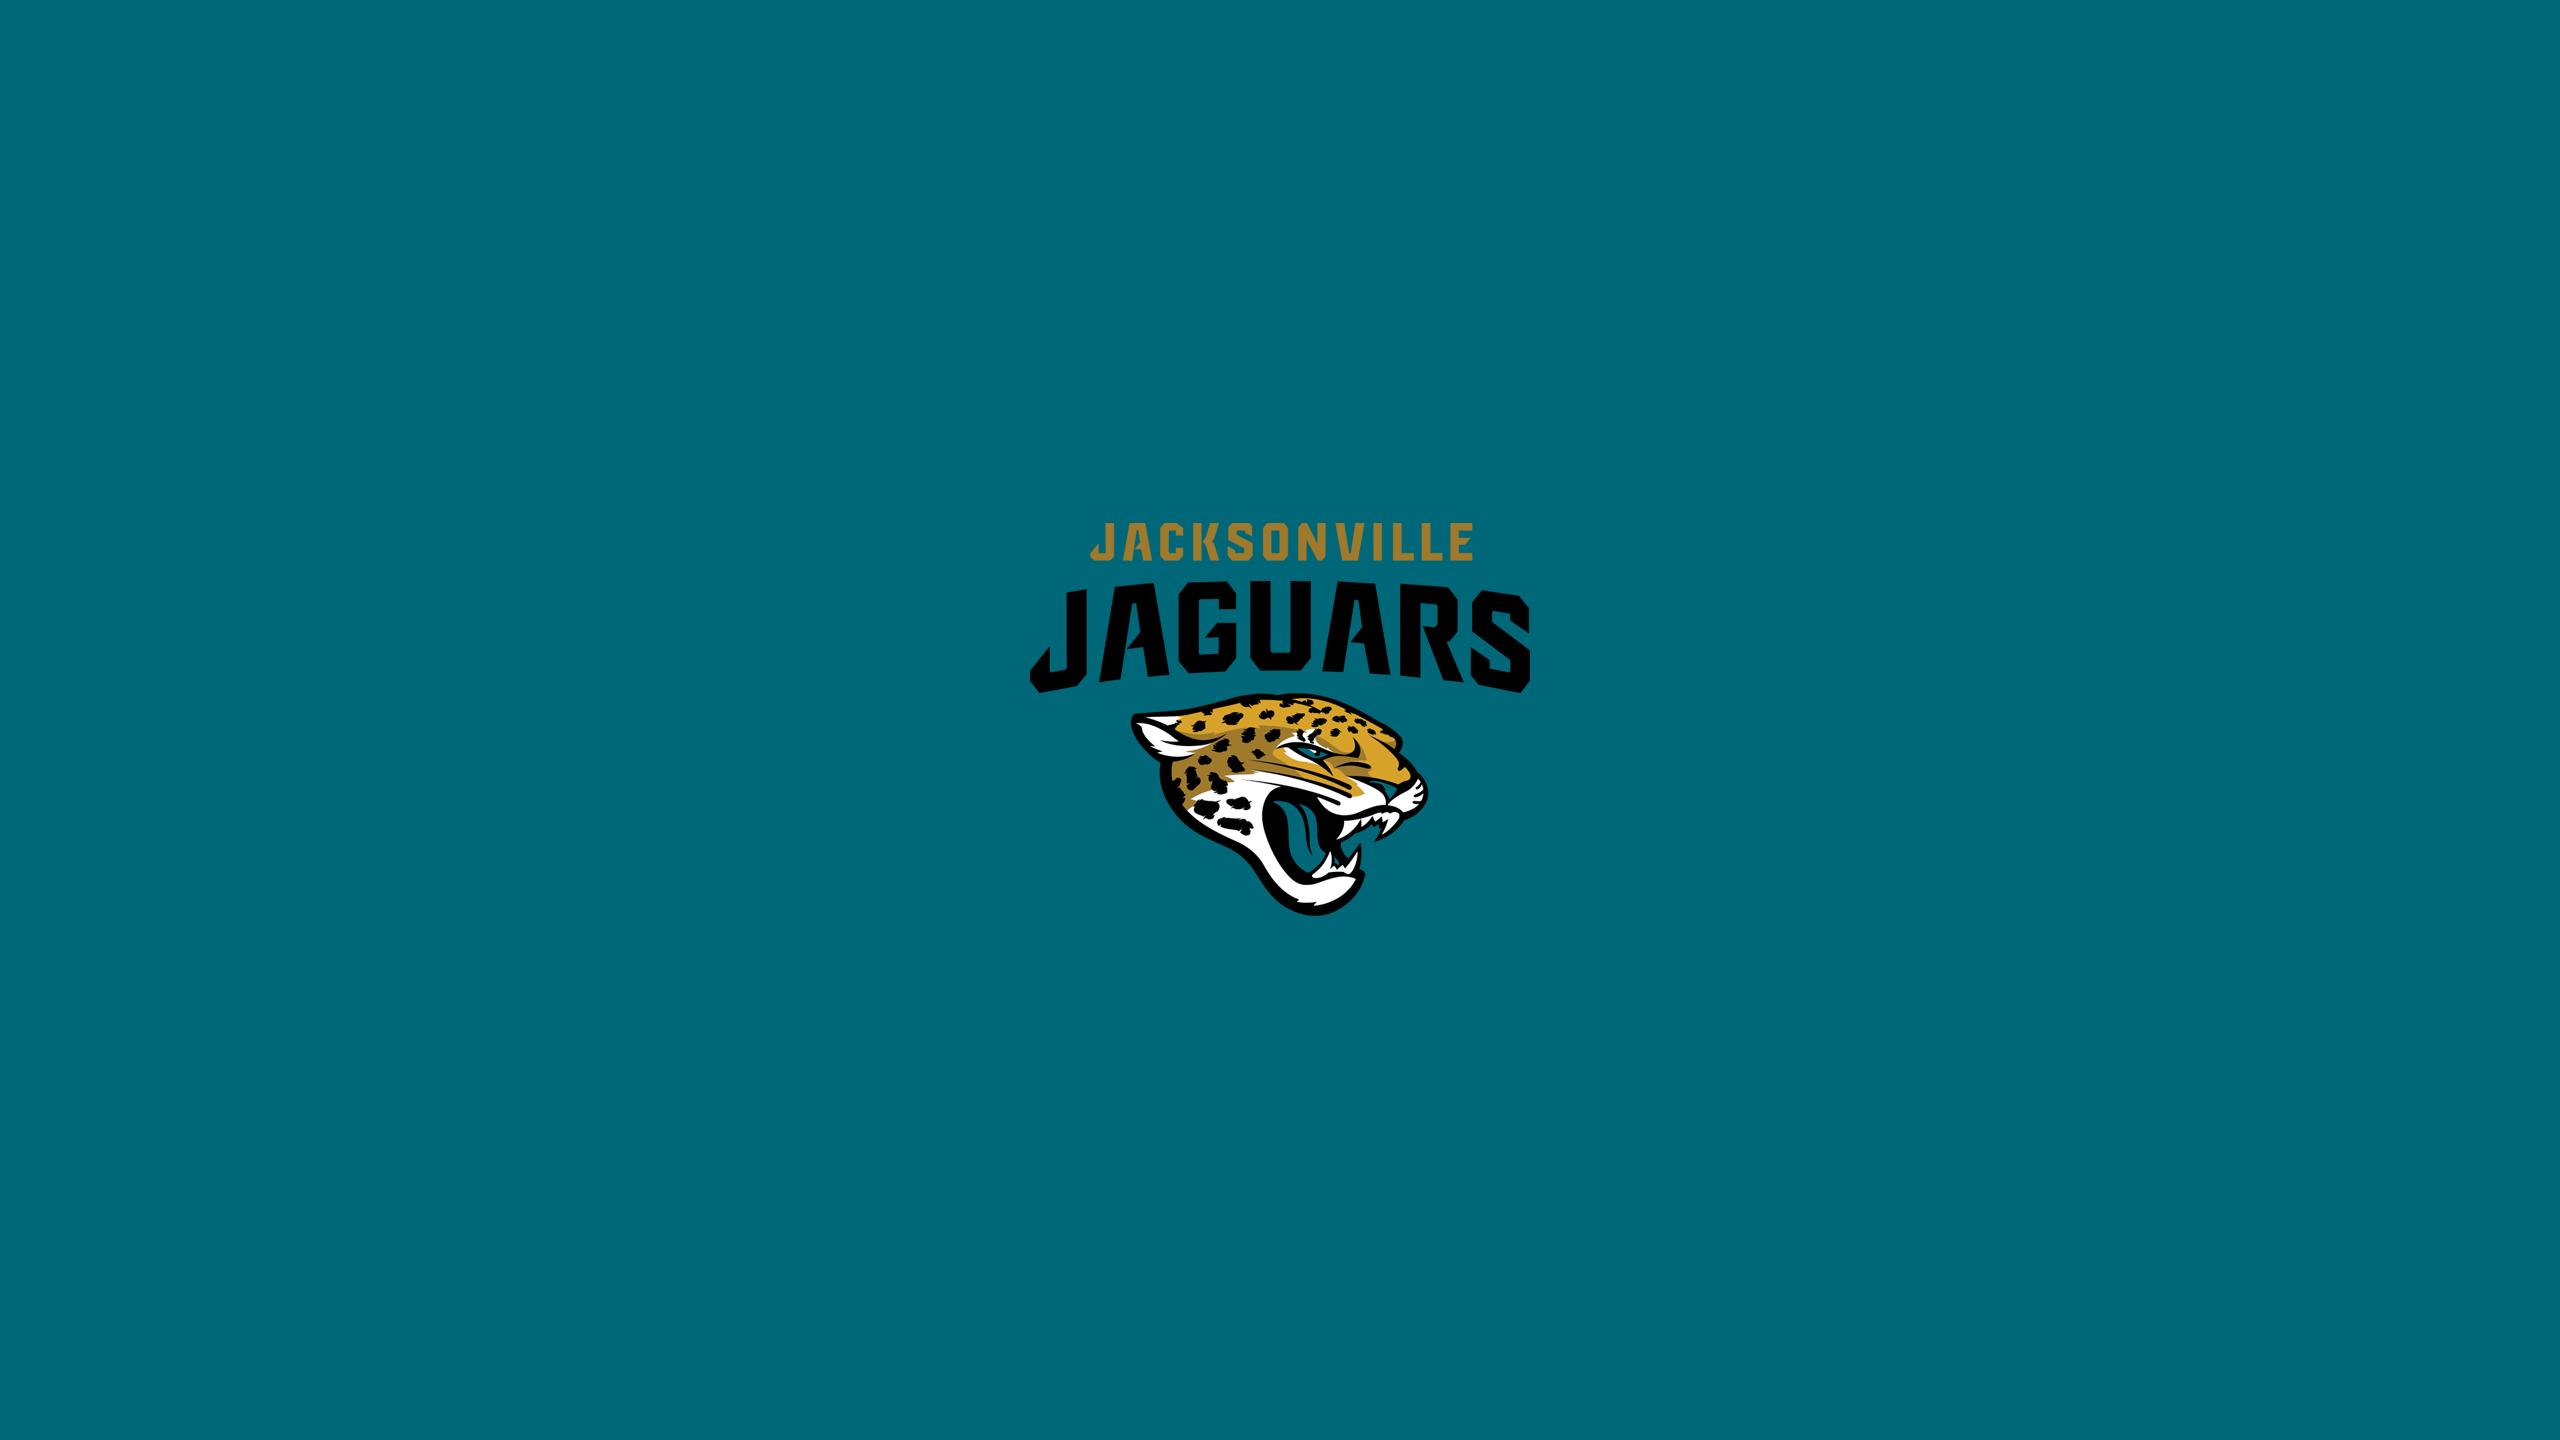 jacksonville jaguars wallpaper 14507